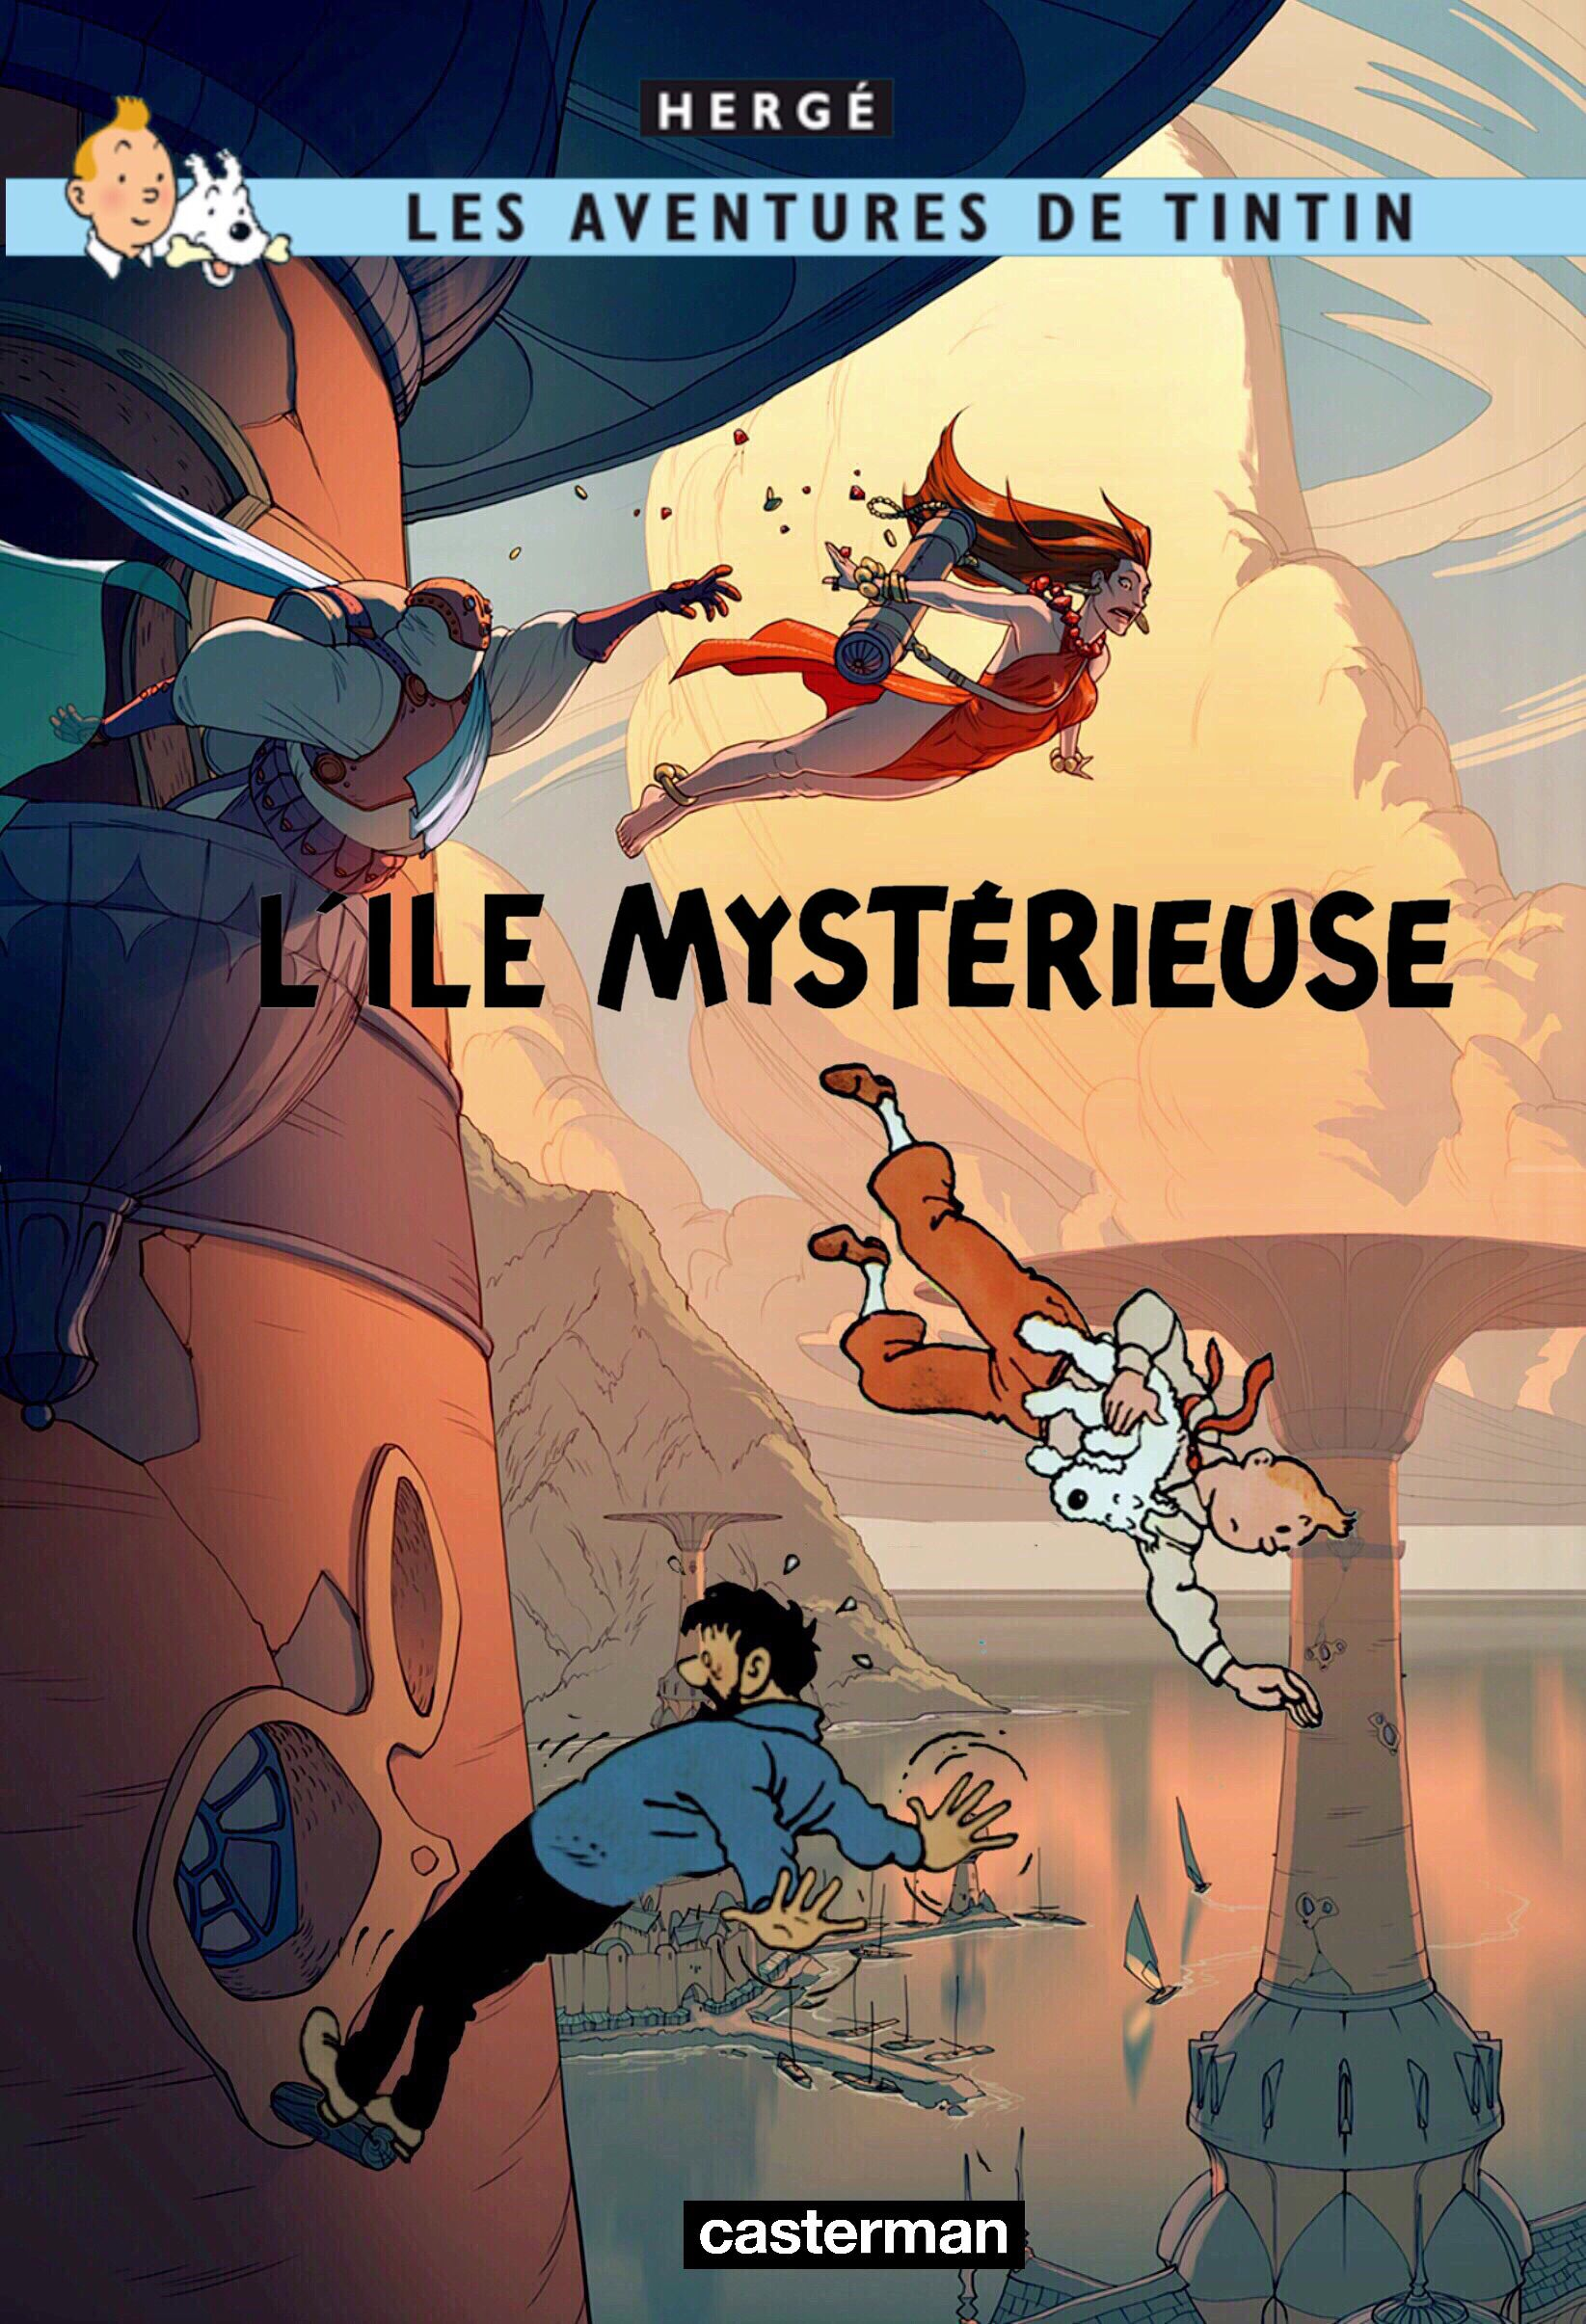 Les Aventures De Tintin Album Imaginaire L Ile Mysterieuse Tintin Herge Bd Tintin